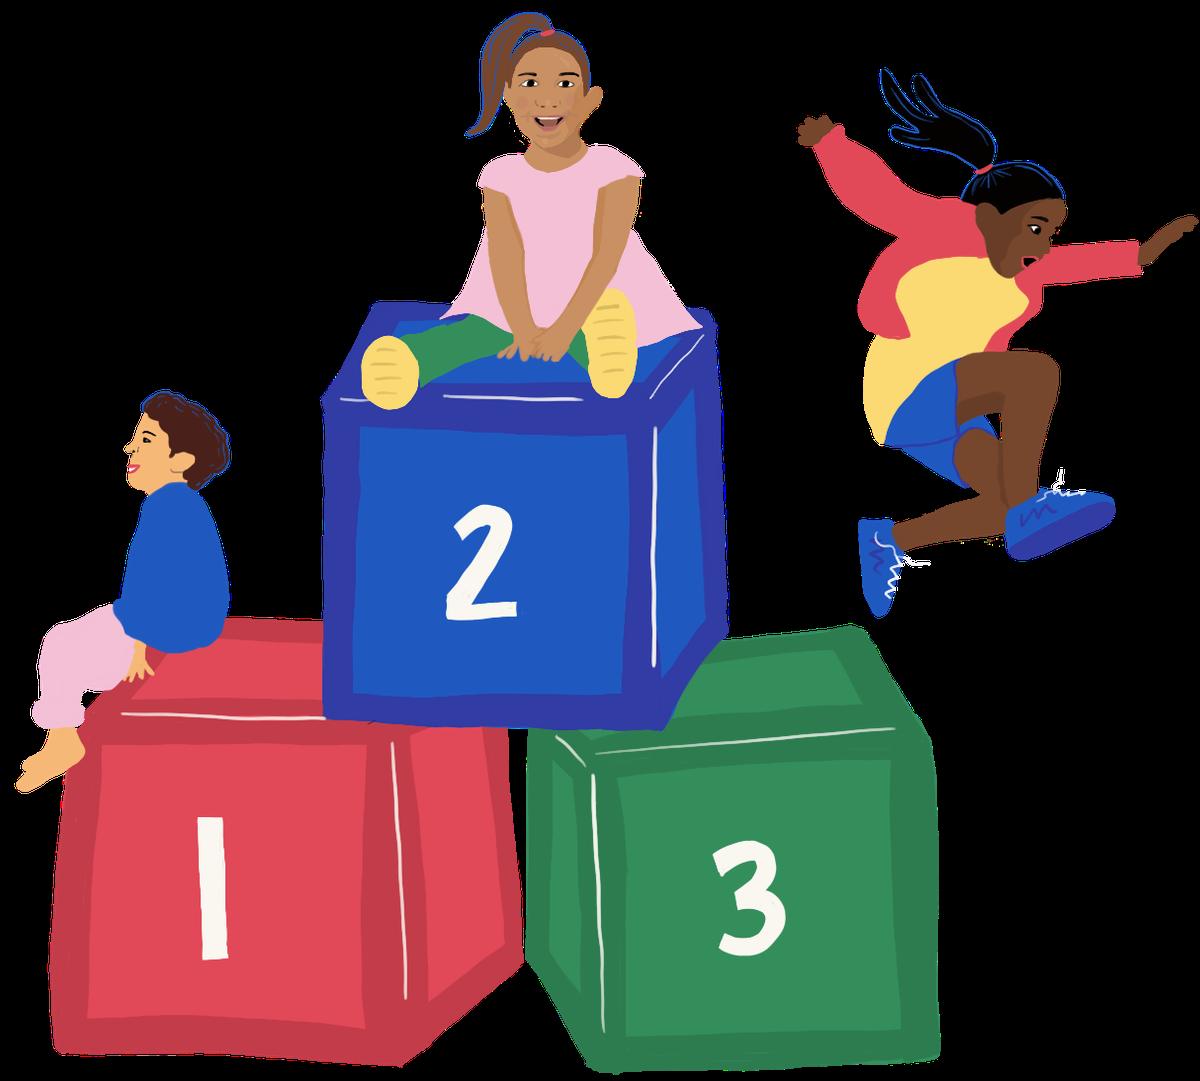 Three children climb on an oversized set of number blocks.